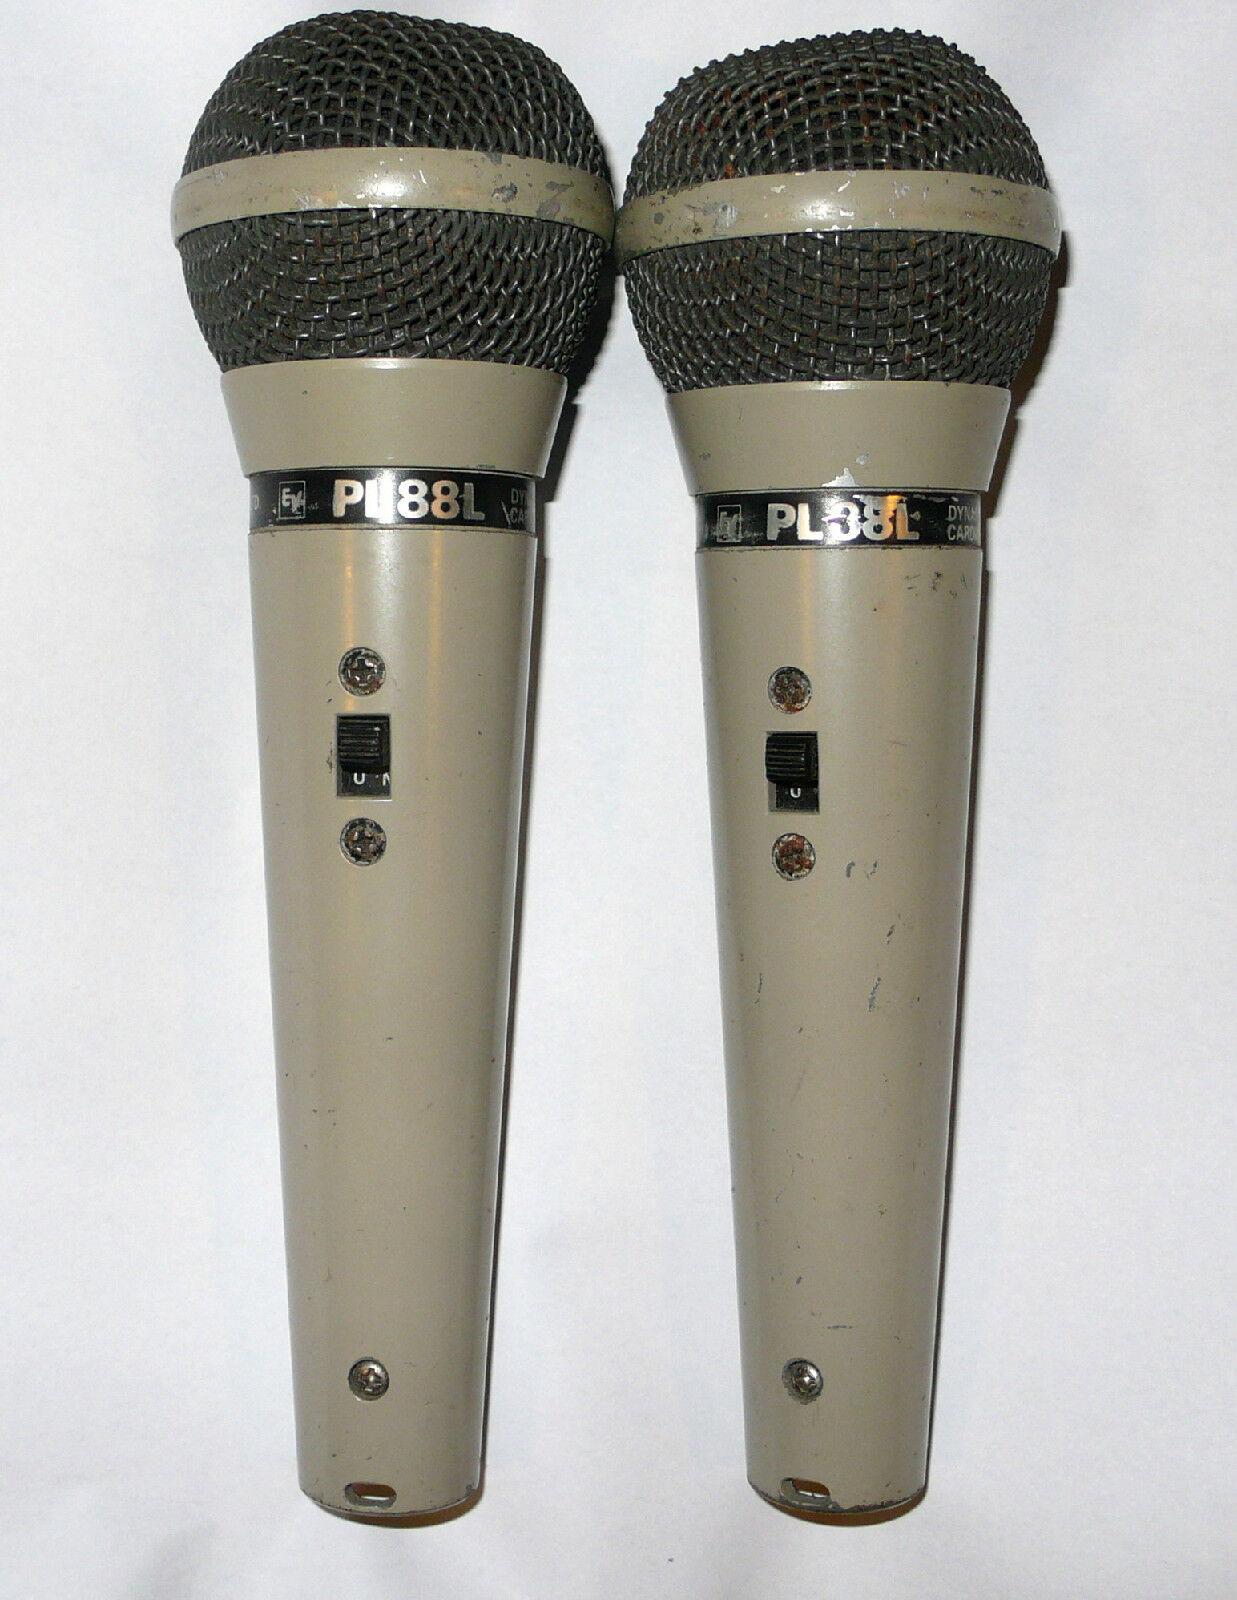 2 MICROS ELECTRO VOICE ( EV ) PL88L    VINTAGE